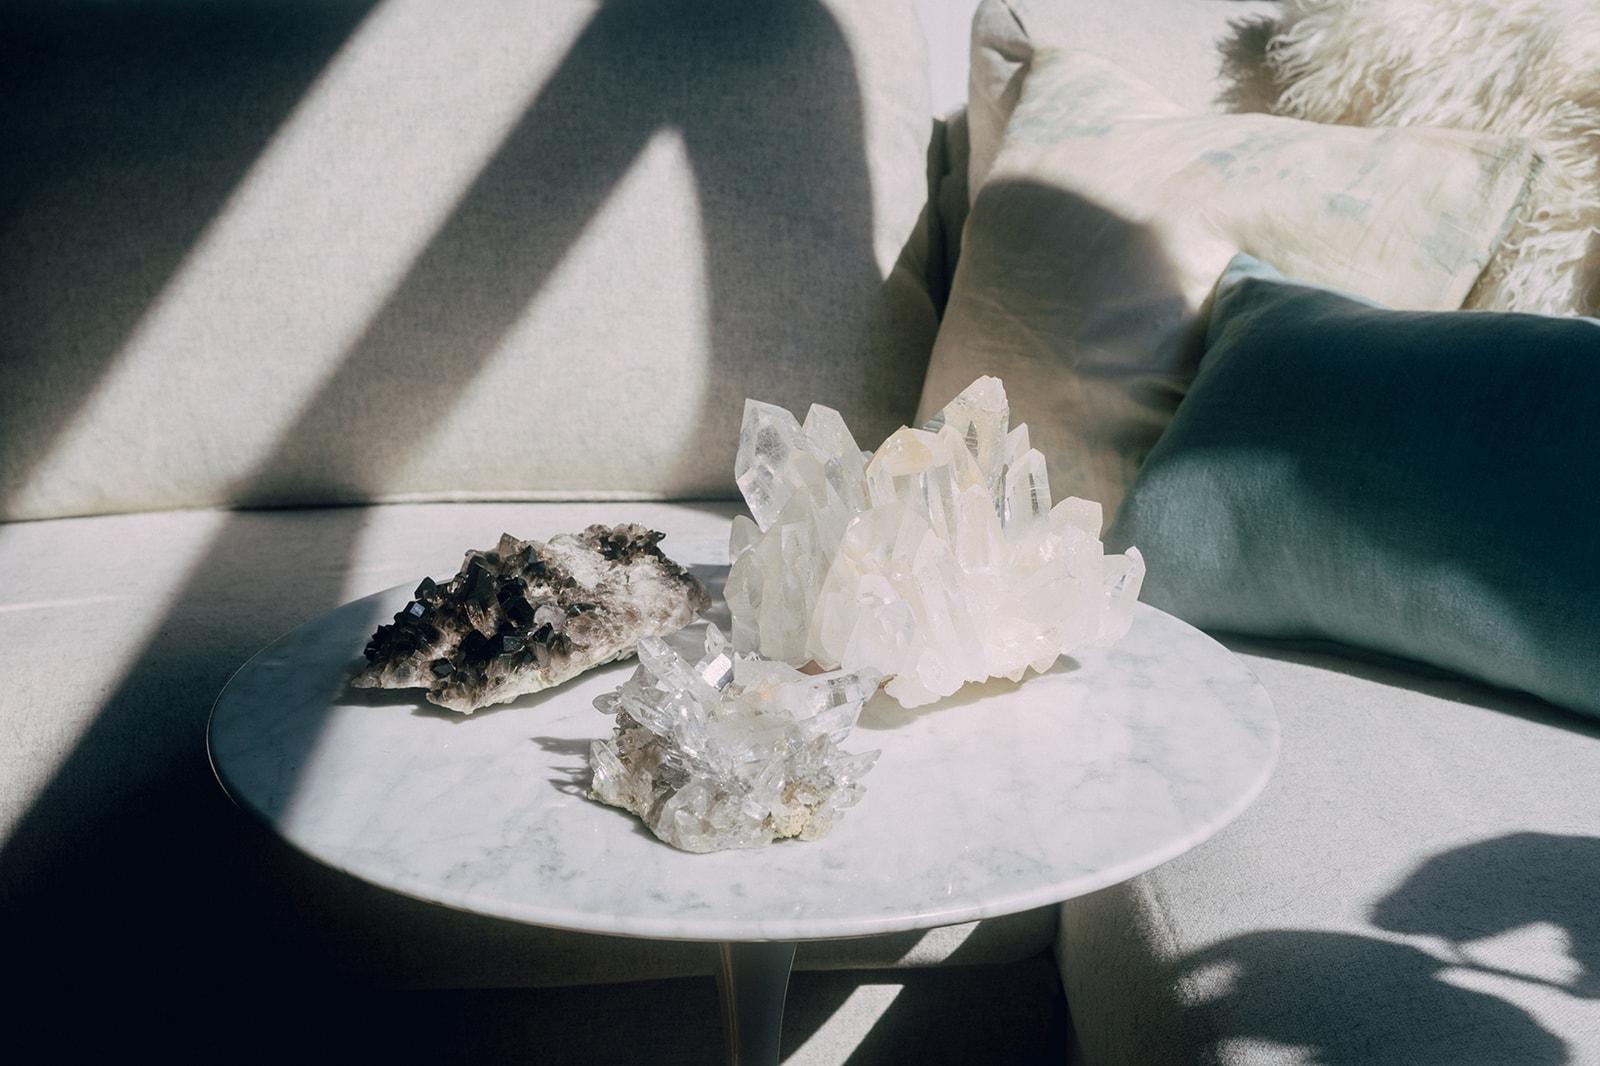 chakra healing crystals quartz points clusters home decor jia jia zhu net a porter